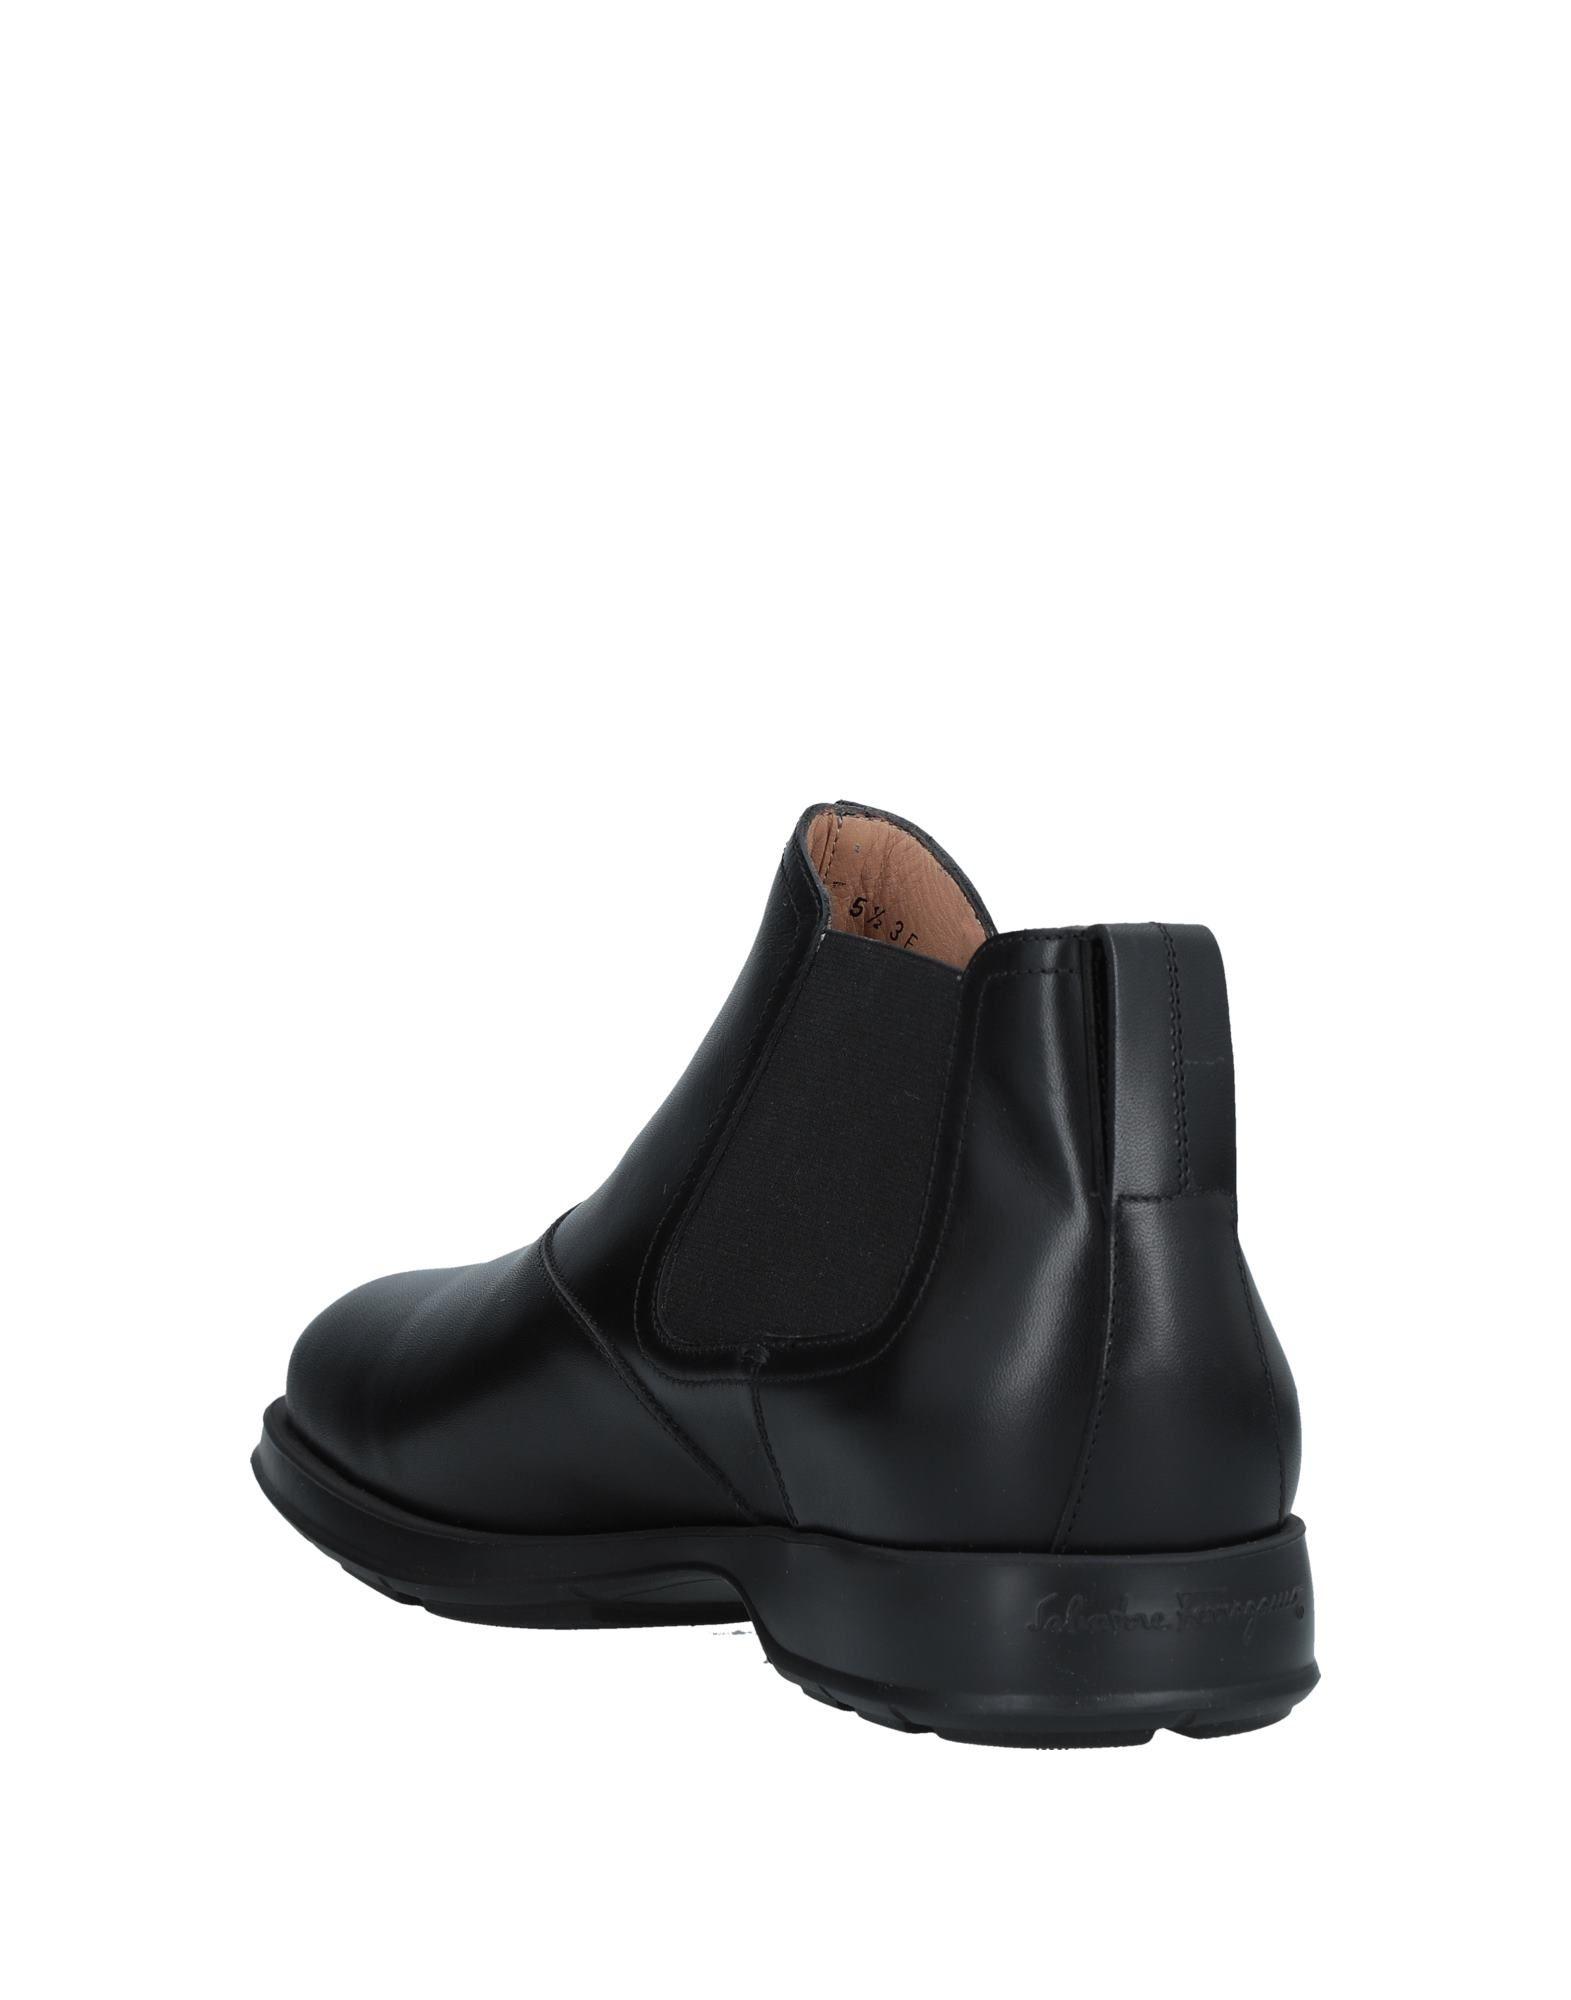 Salvatore Ferragamo Stiefelette Stiefelette Stiefelette Herren  11528602VV Neue Schuhe 5a13a0